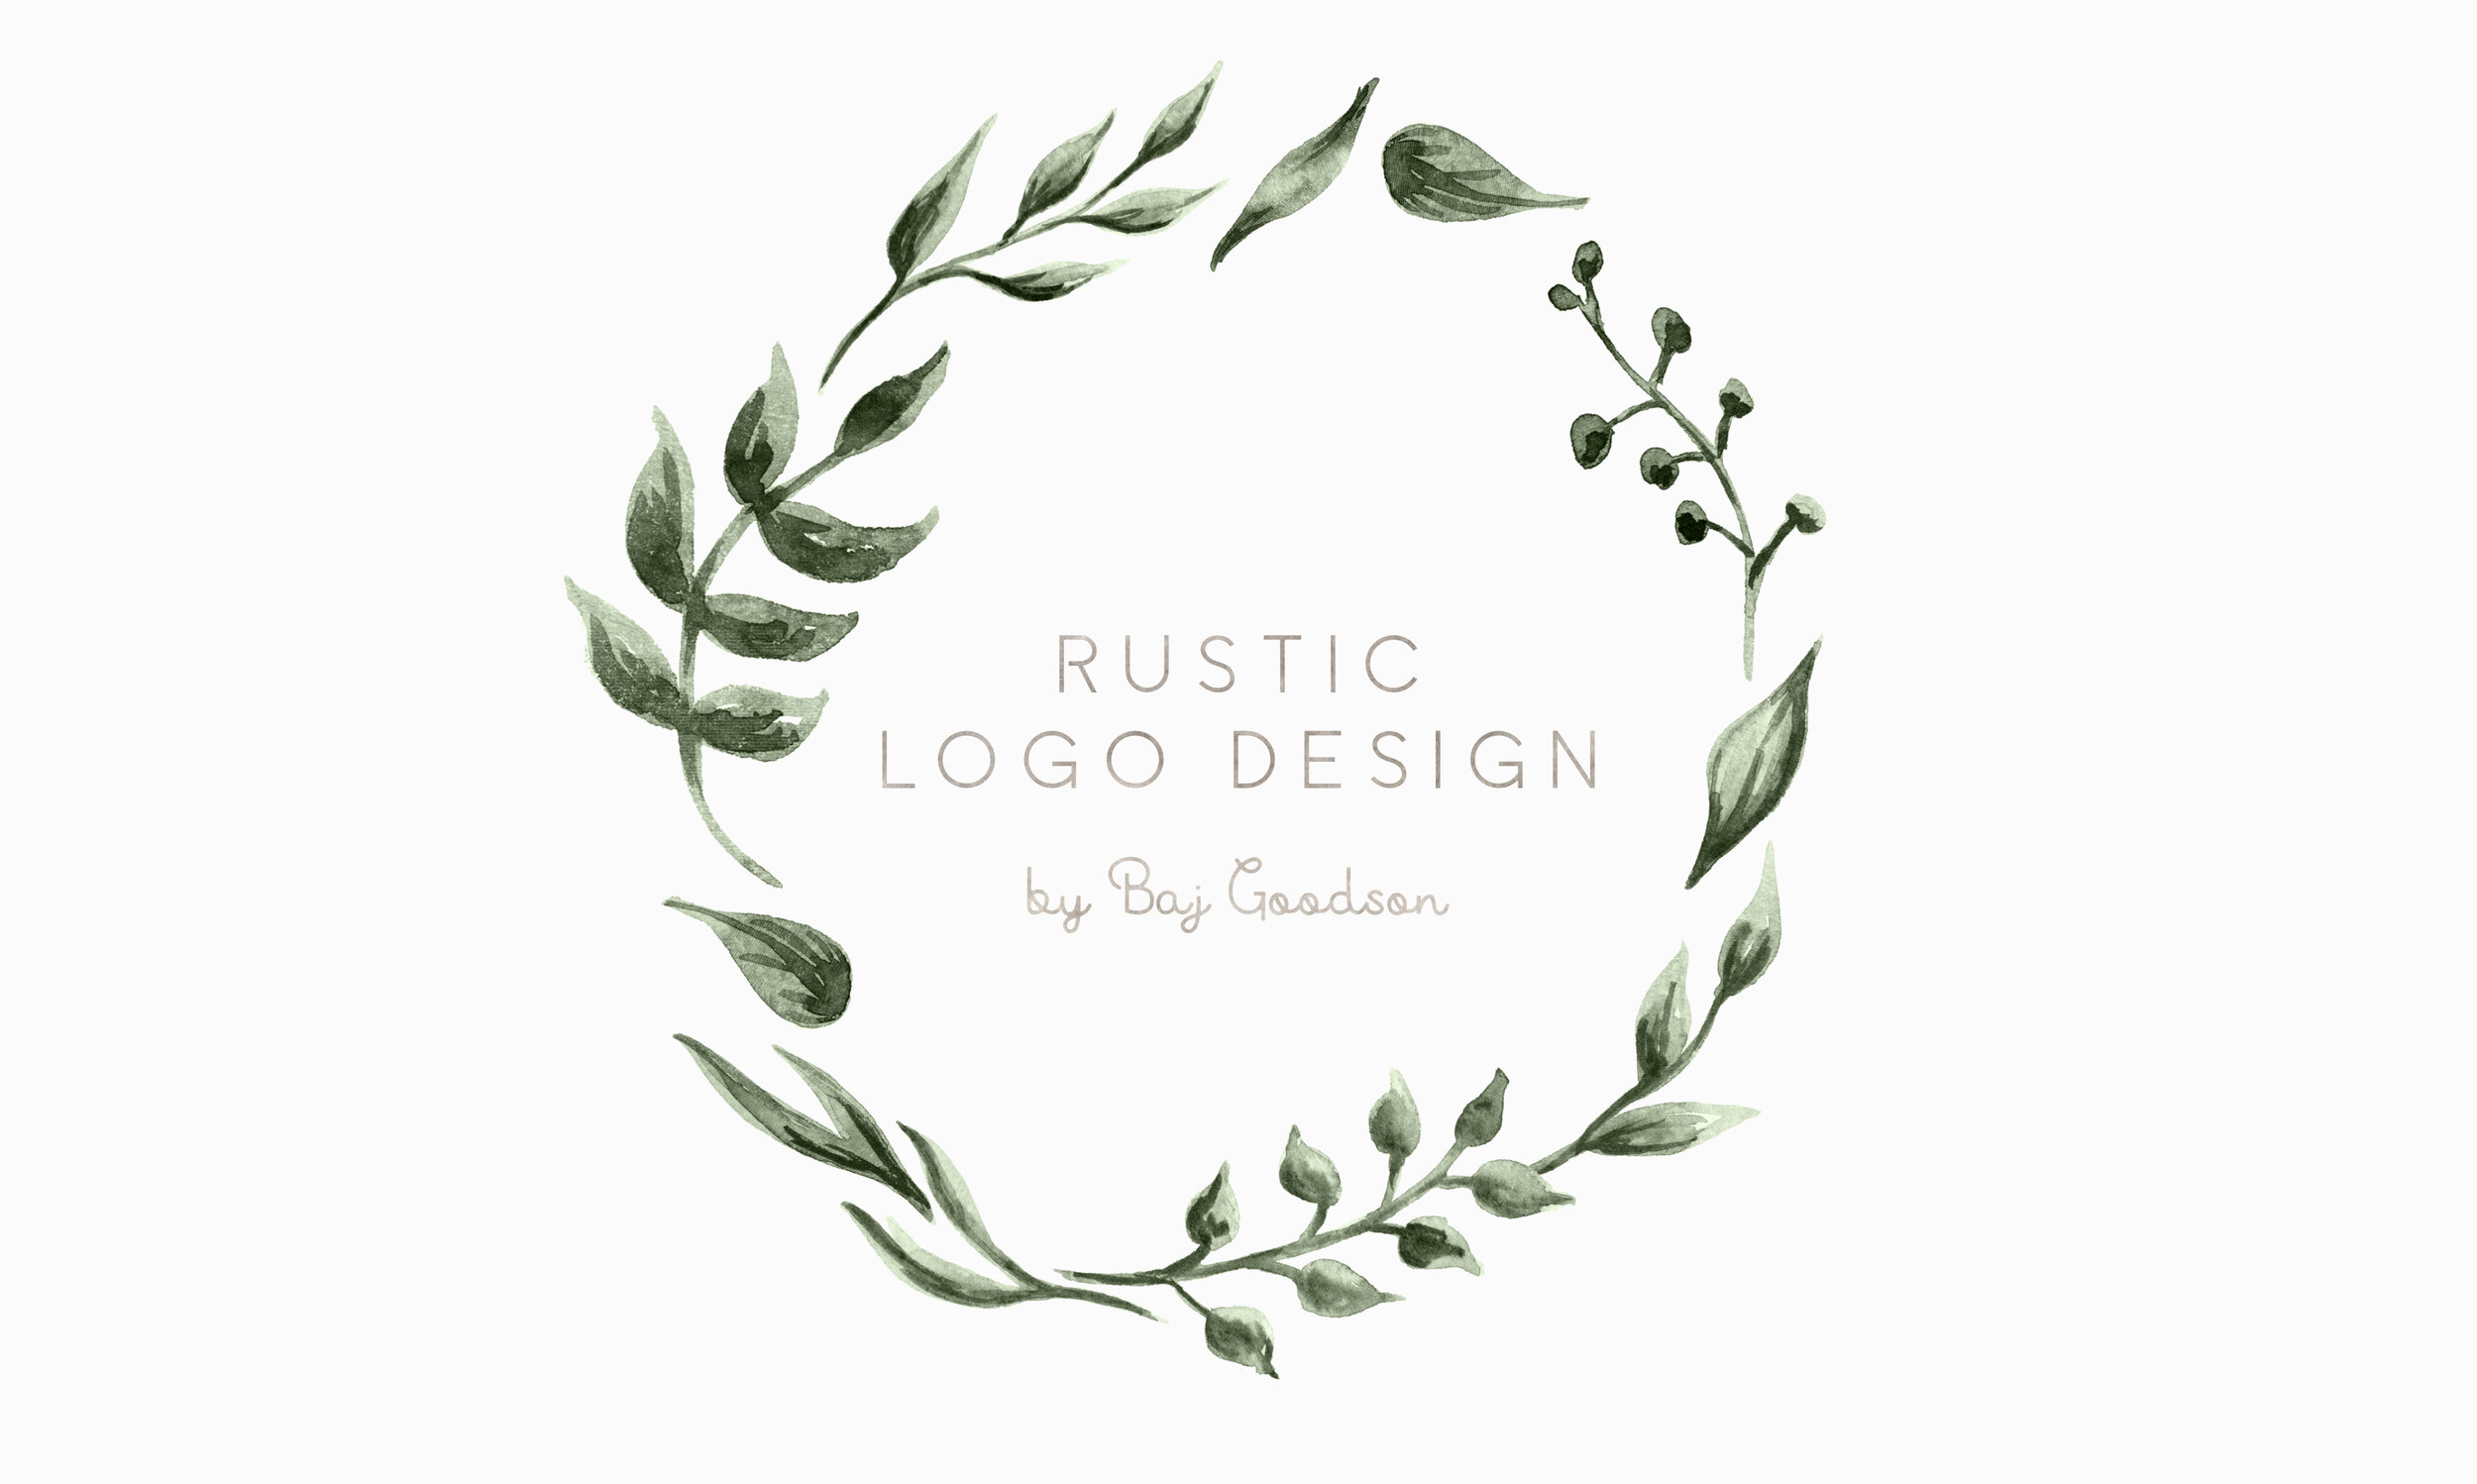 Rustic - Behance Cover.jpg